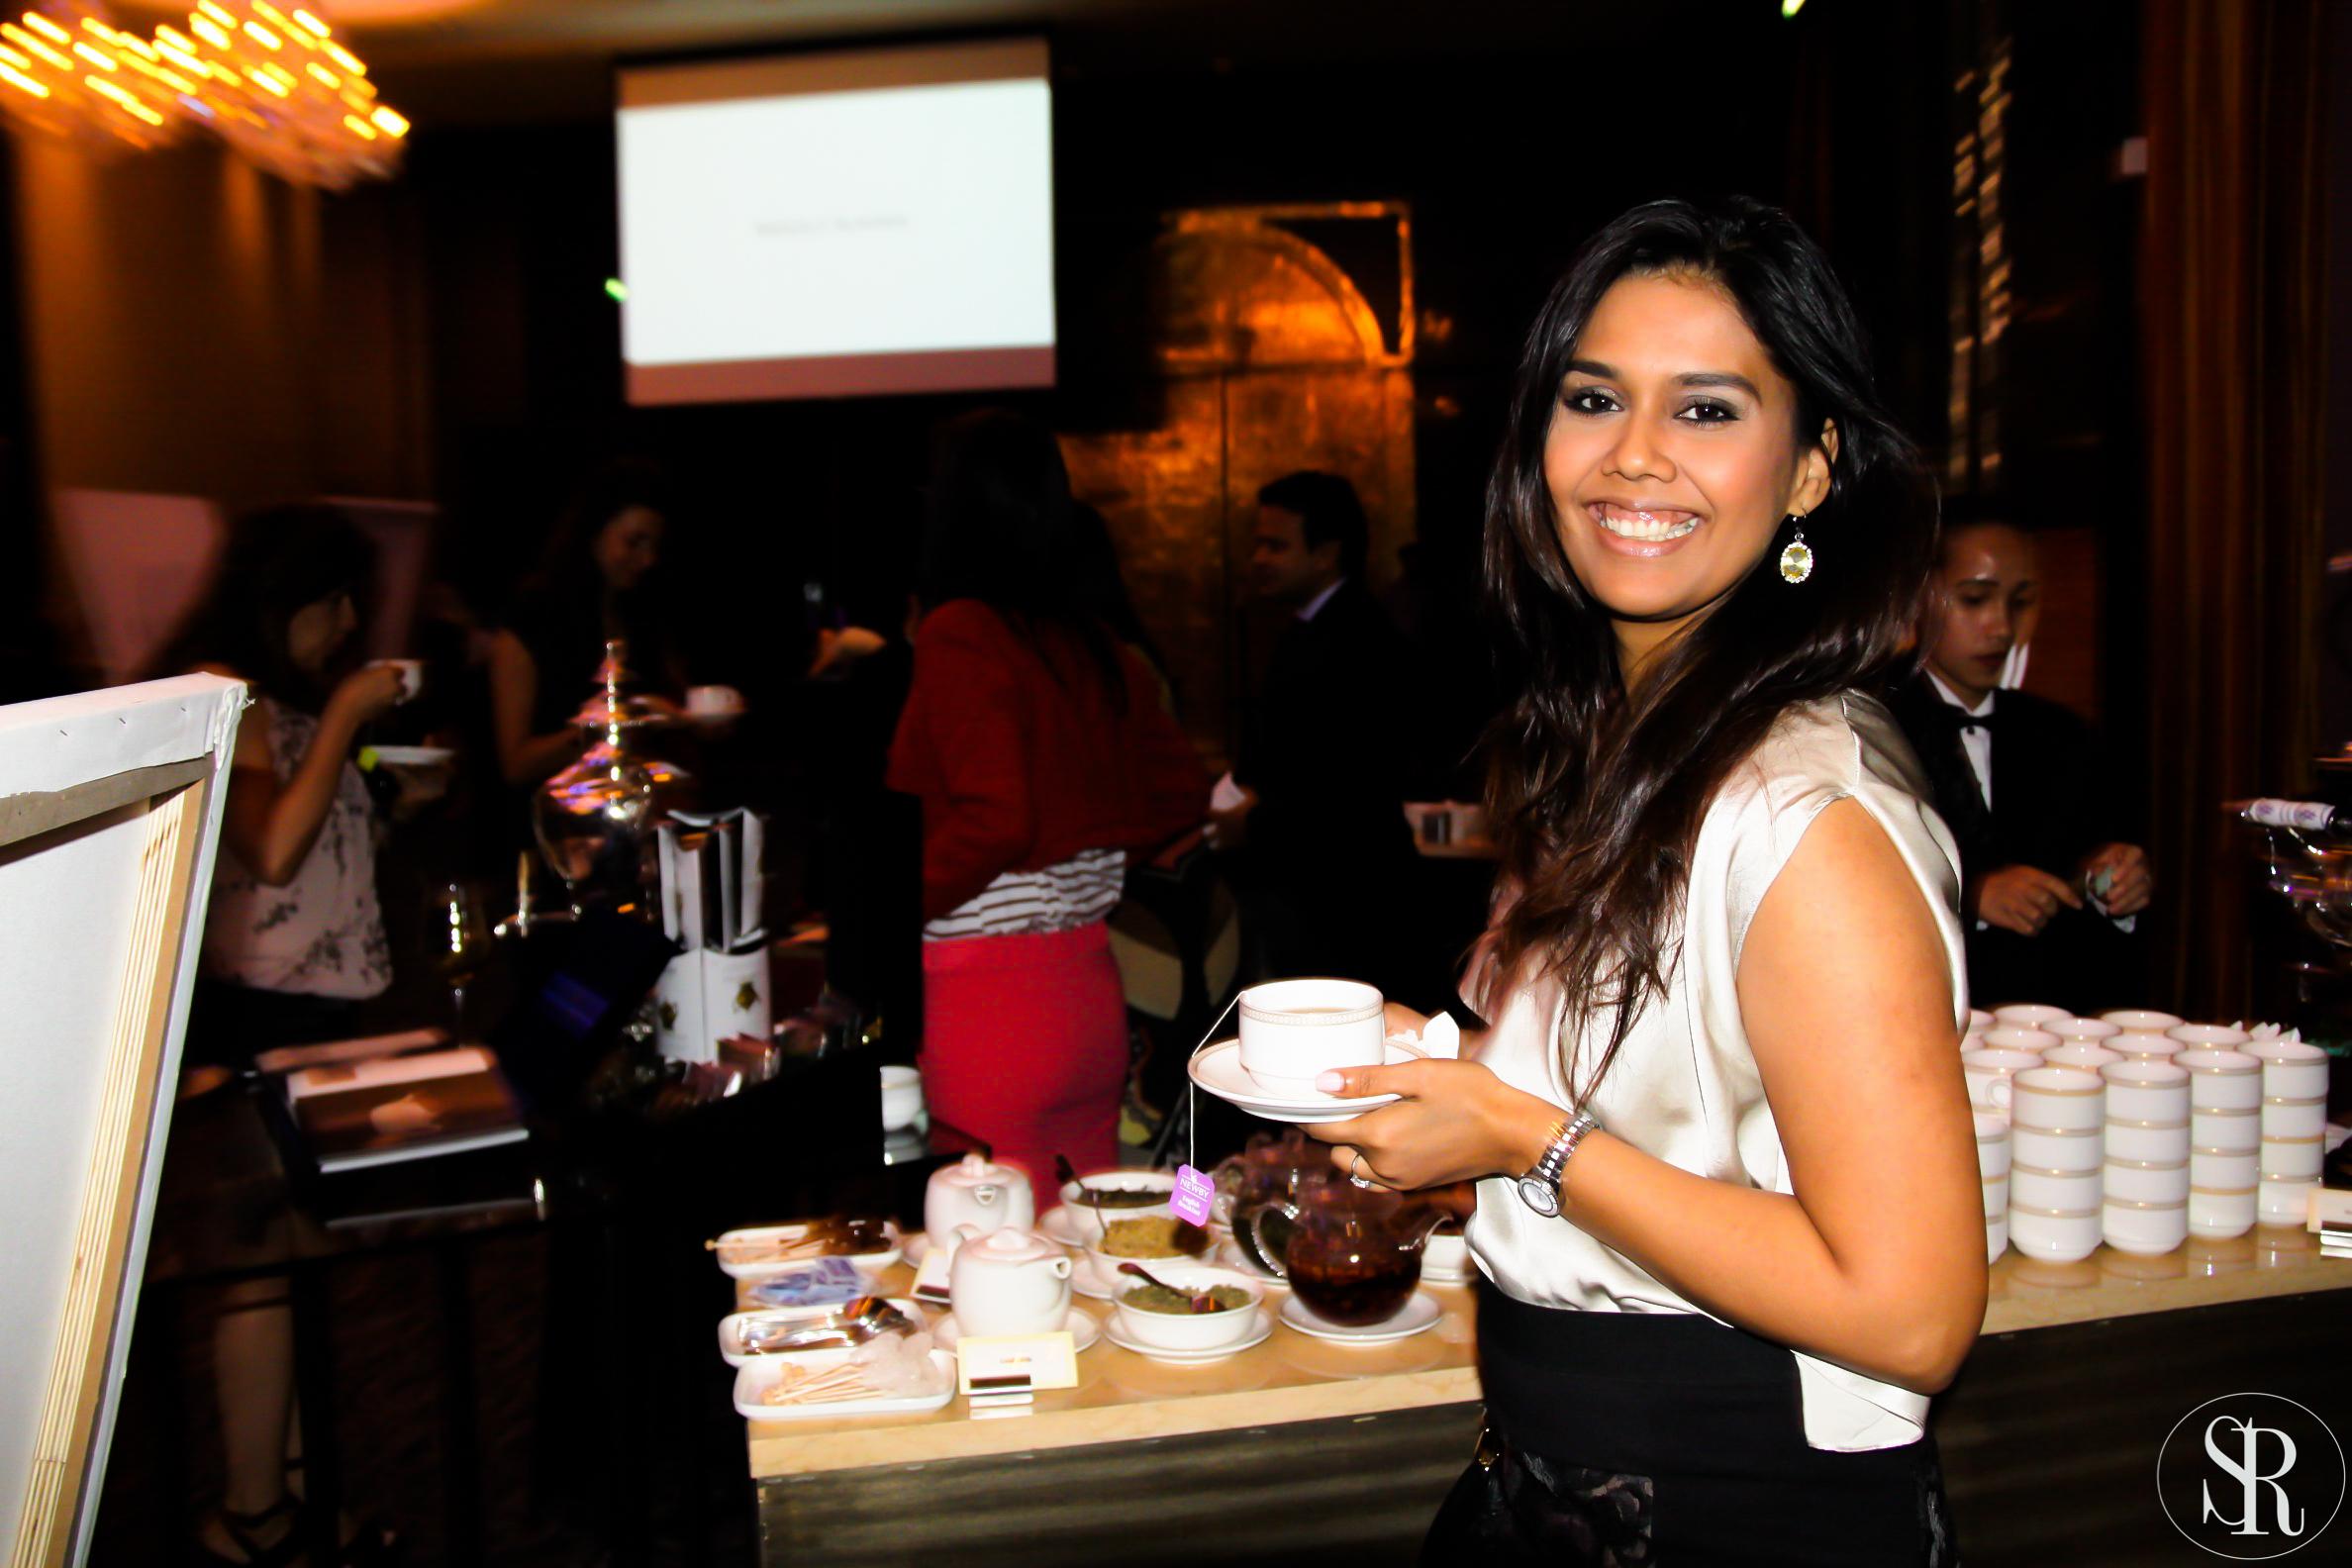 VIP launch of MANOLO BLAHNIK collection Fashion Afternoon Tea by Raffles Dubai-4133.jpg